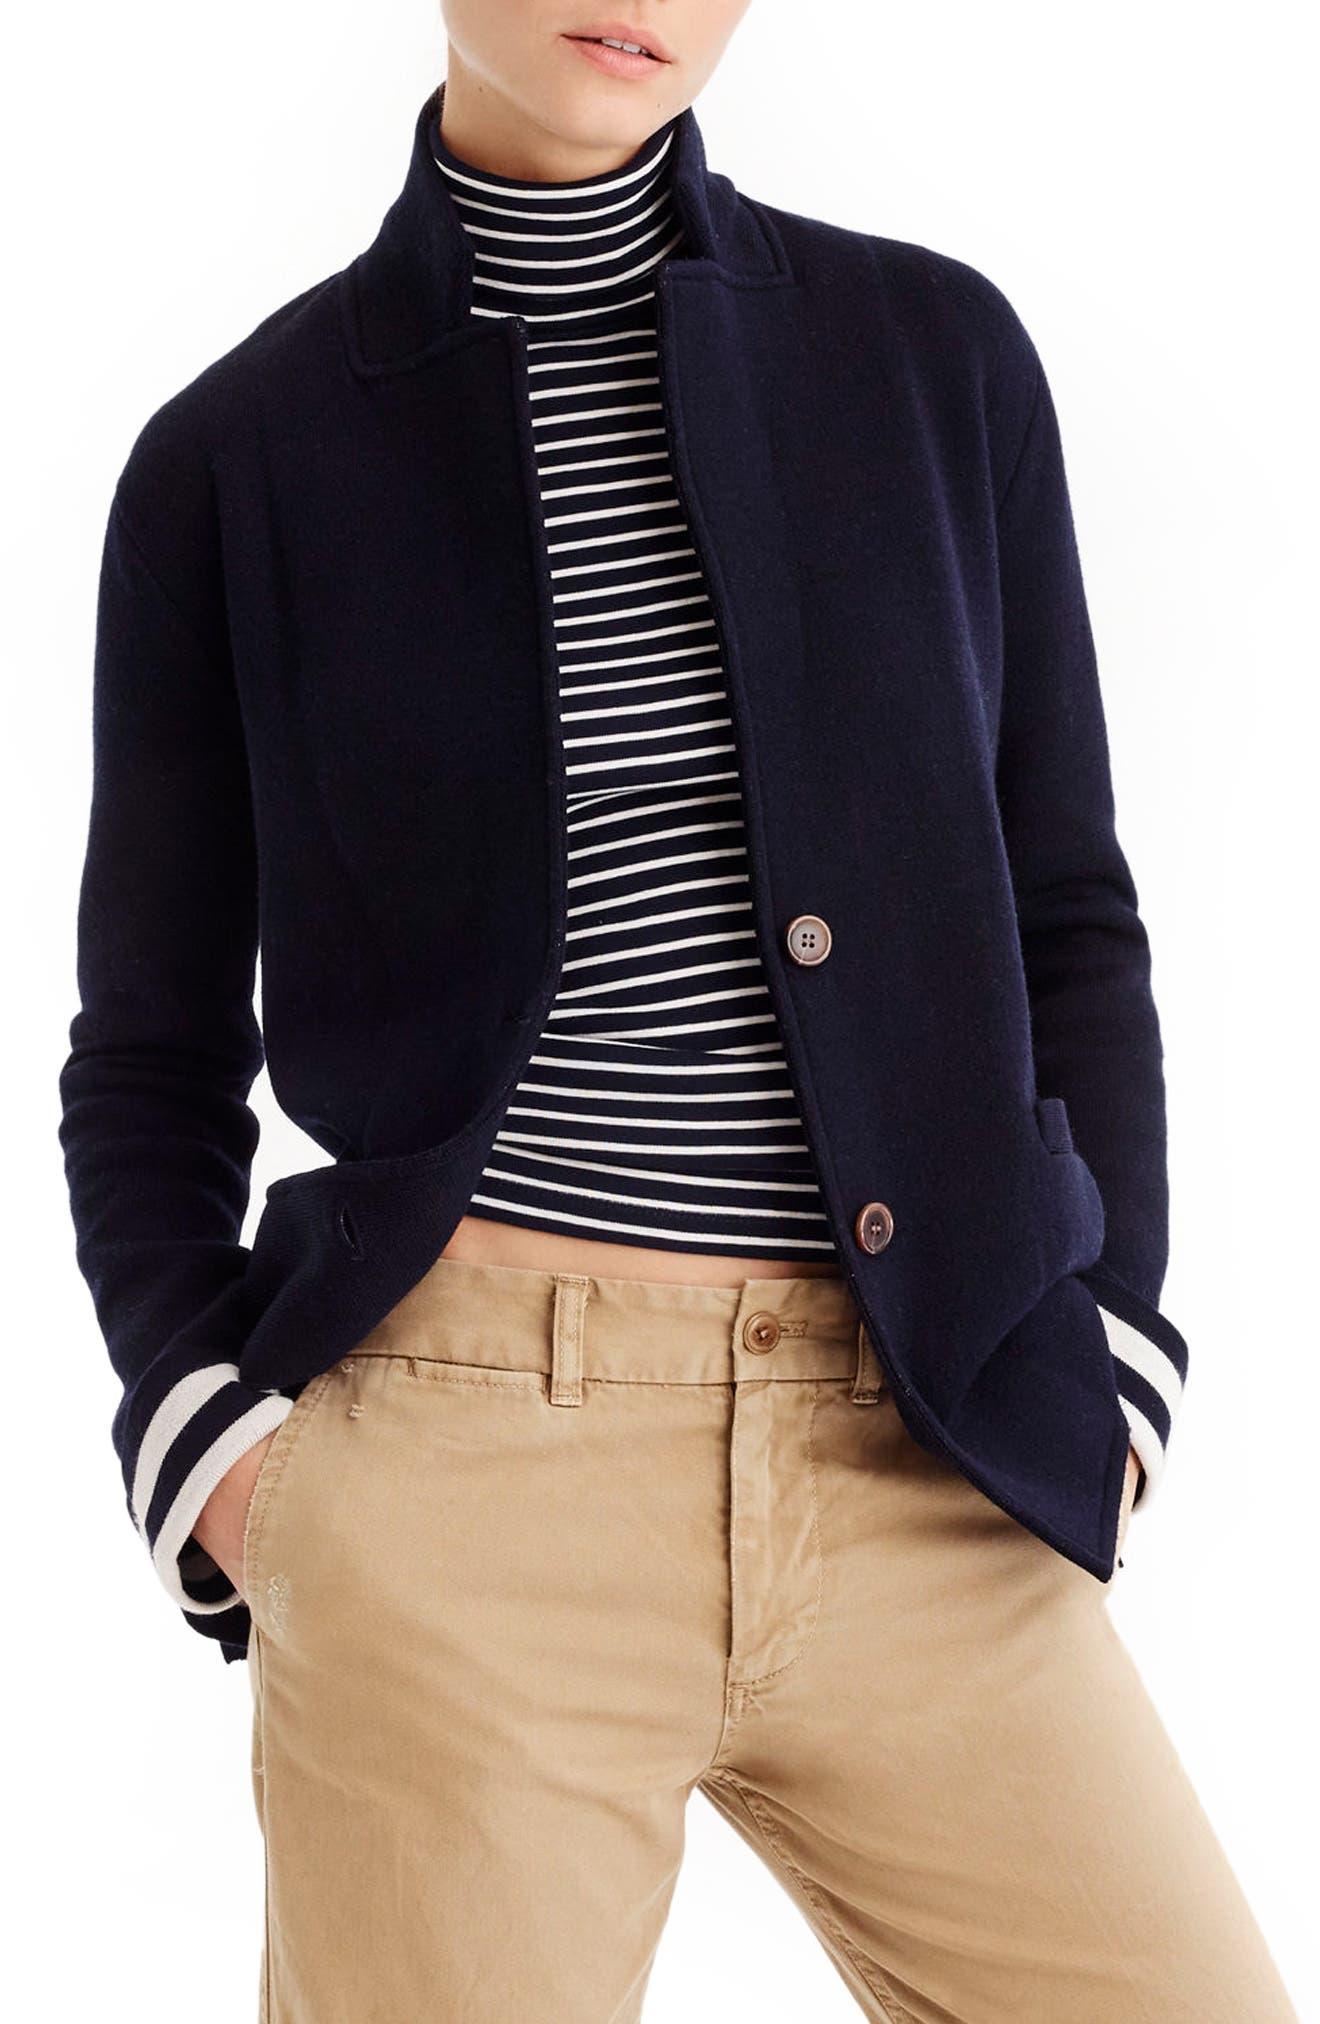 Stripe Lining Merino Wool Sweater Blazer,                         Main,                         color, Ivory/ Navy